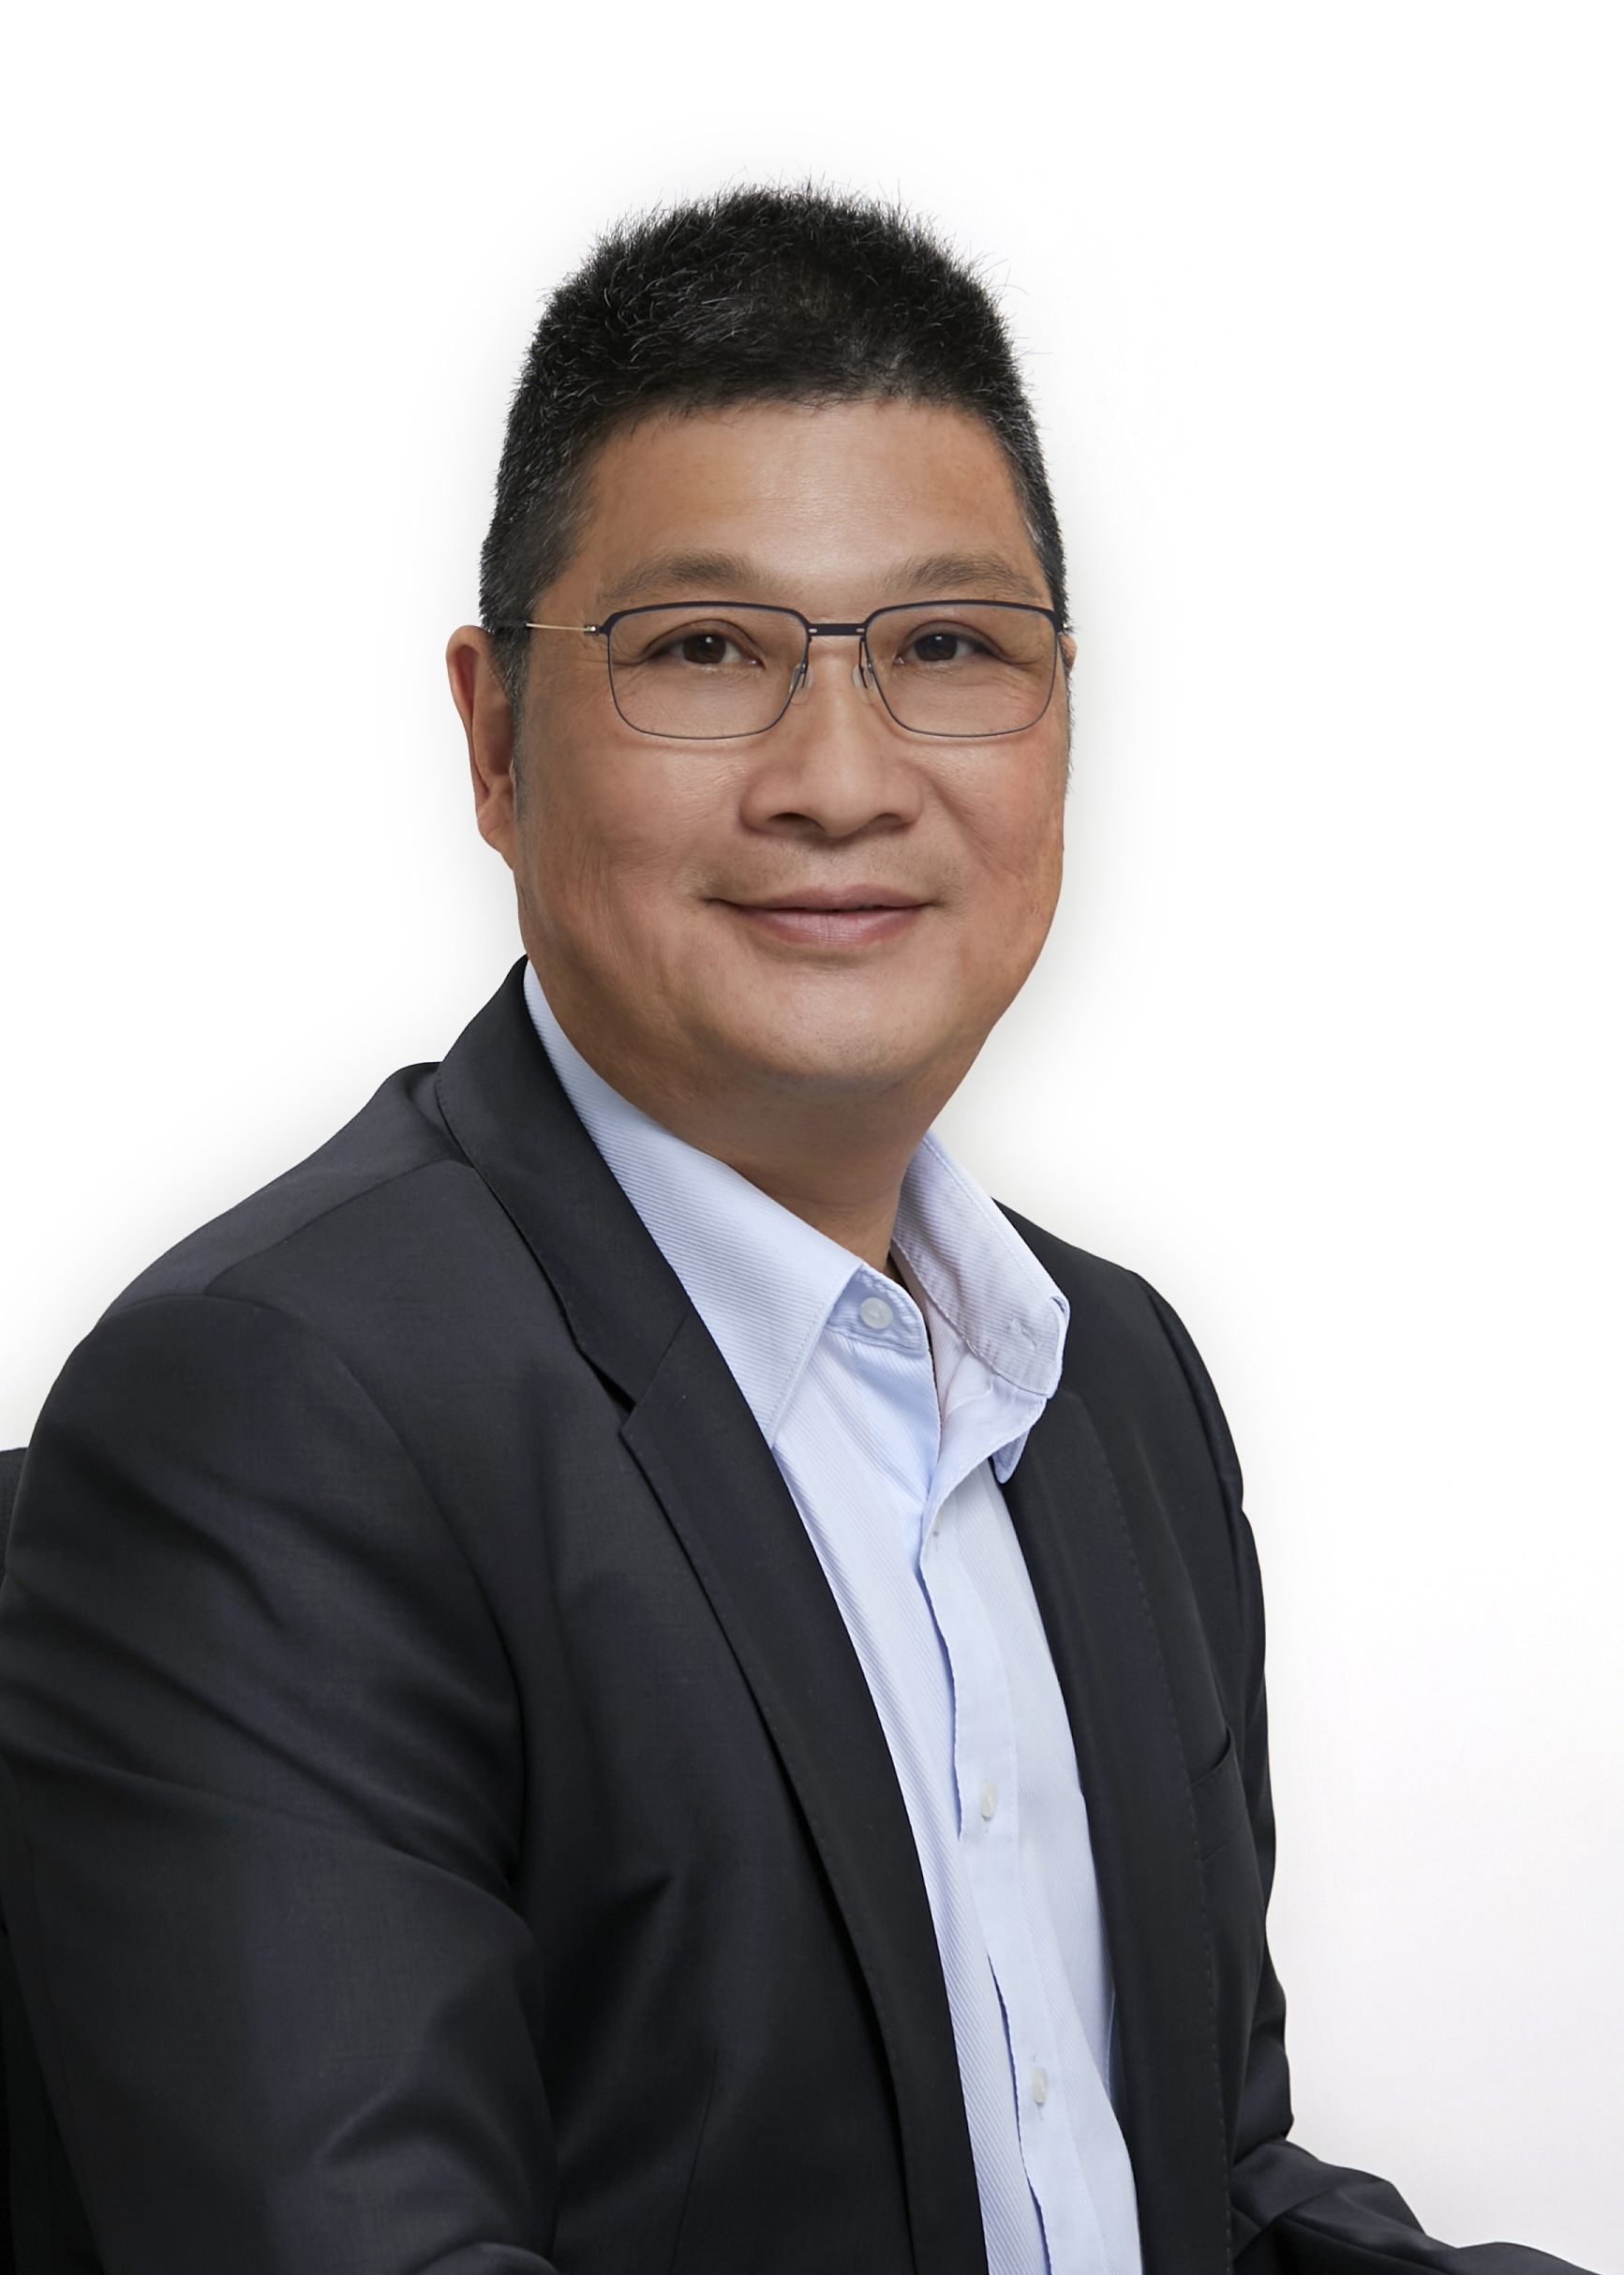 Raymond Hung